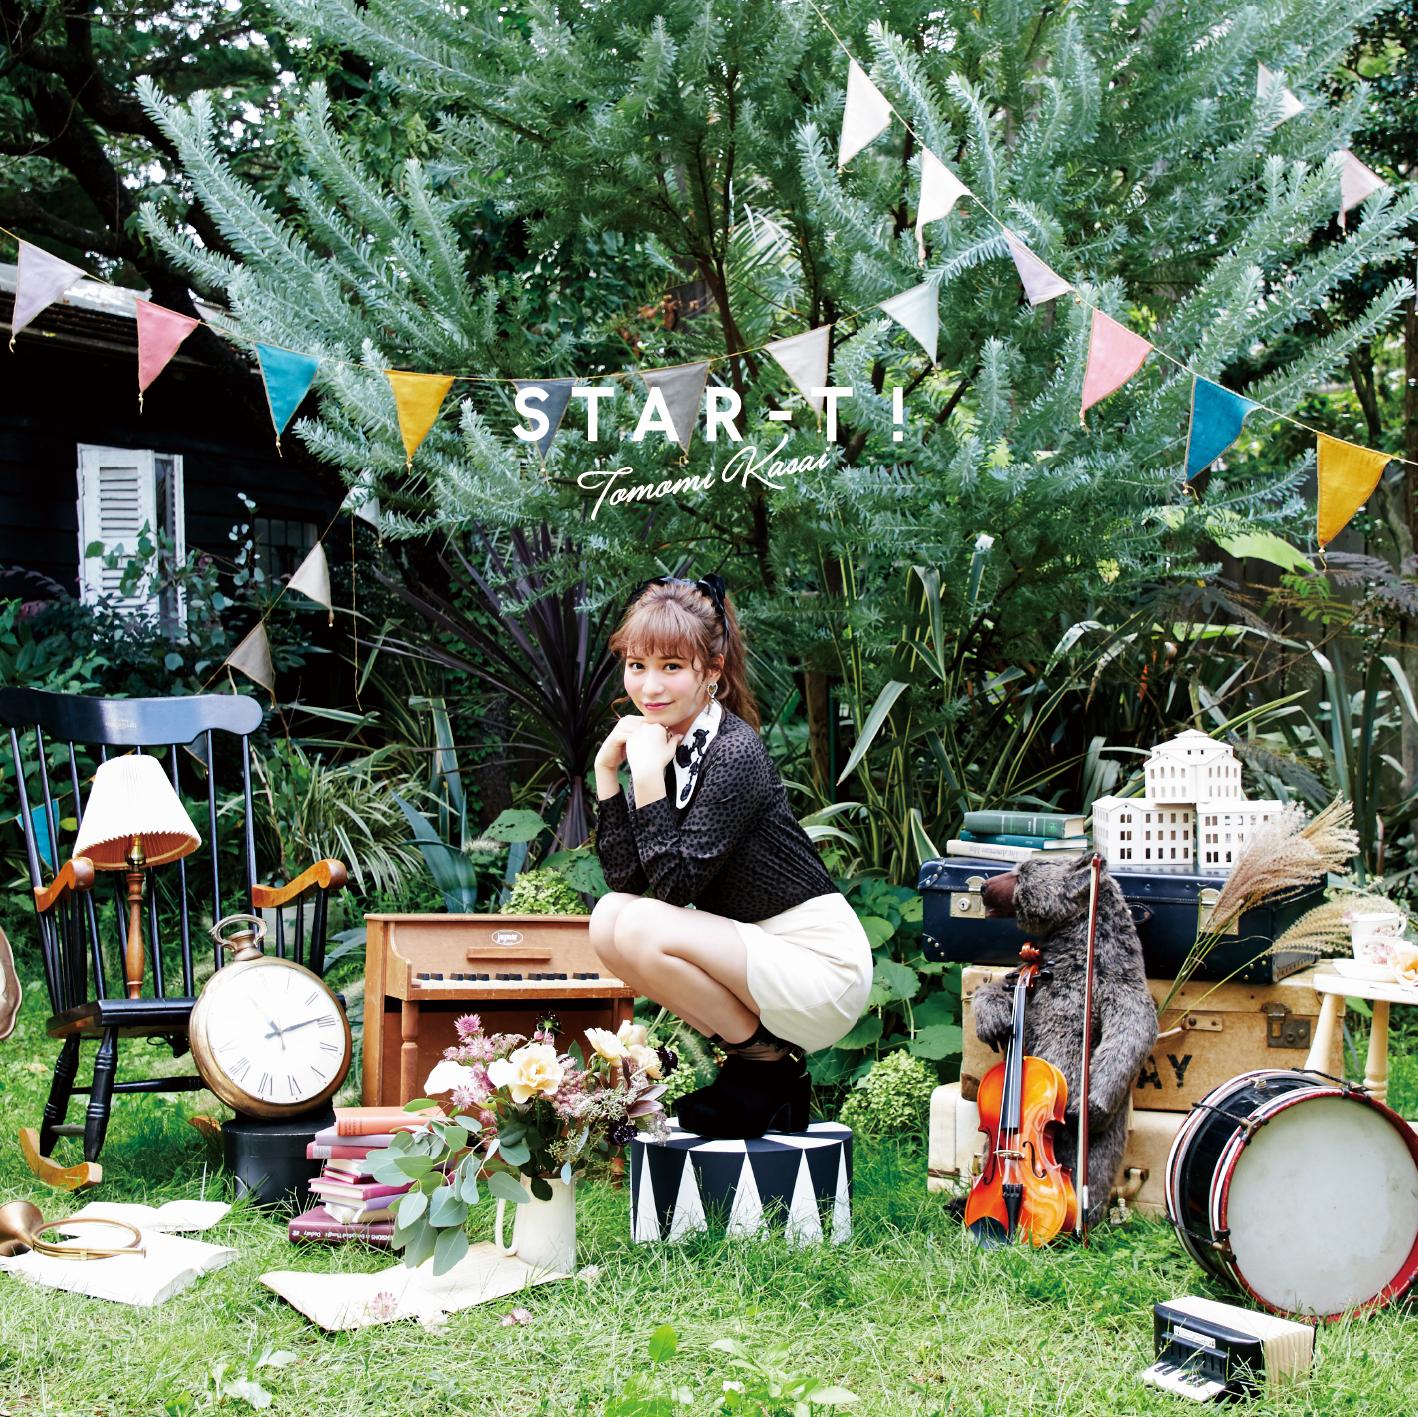 20180704.2316.21 Tomomi Kasai - STAR-T! (Type B) cover 2.jpg